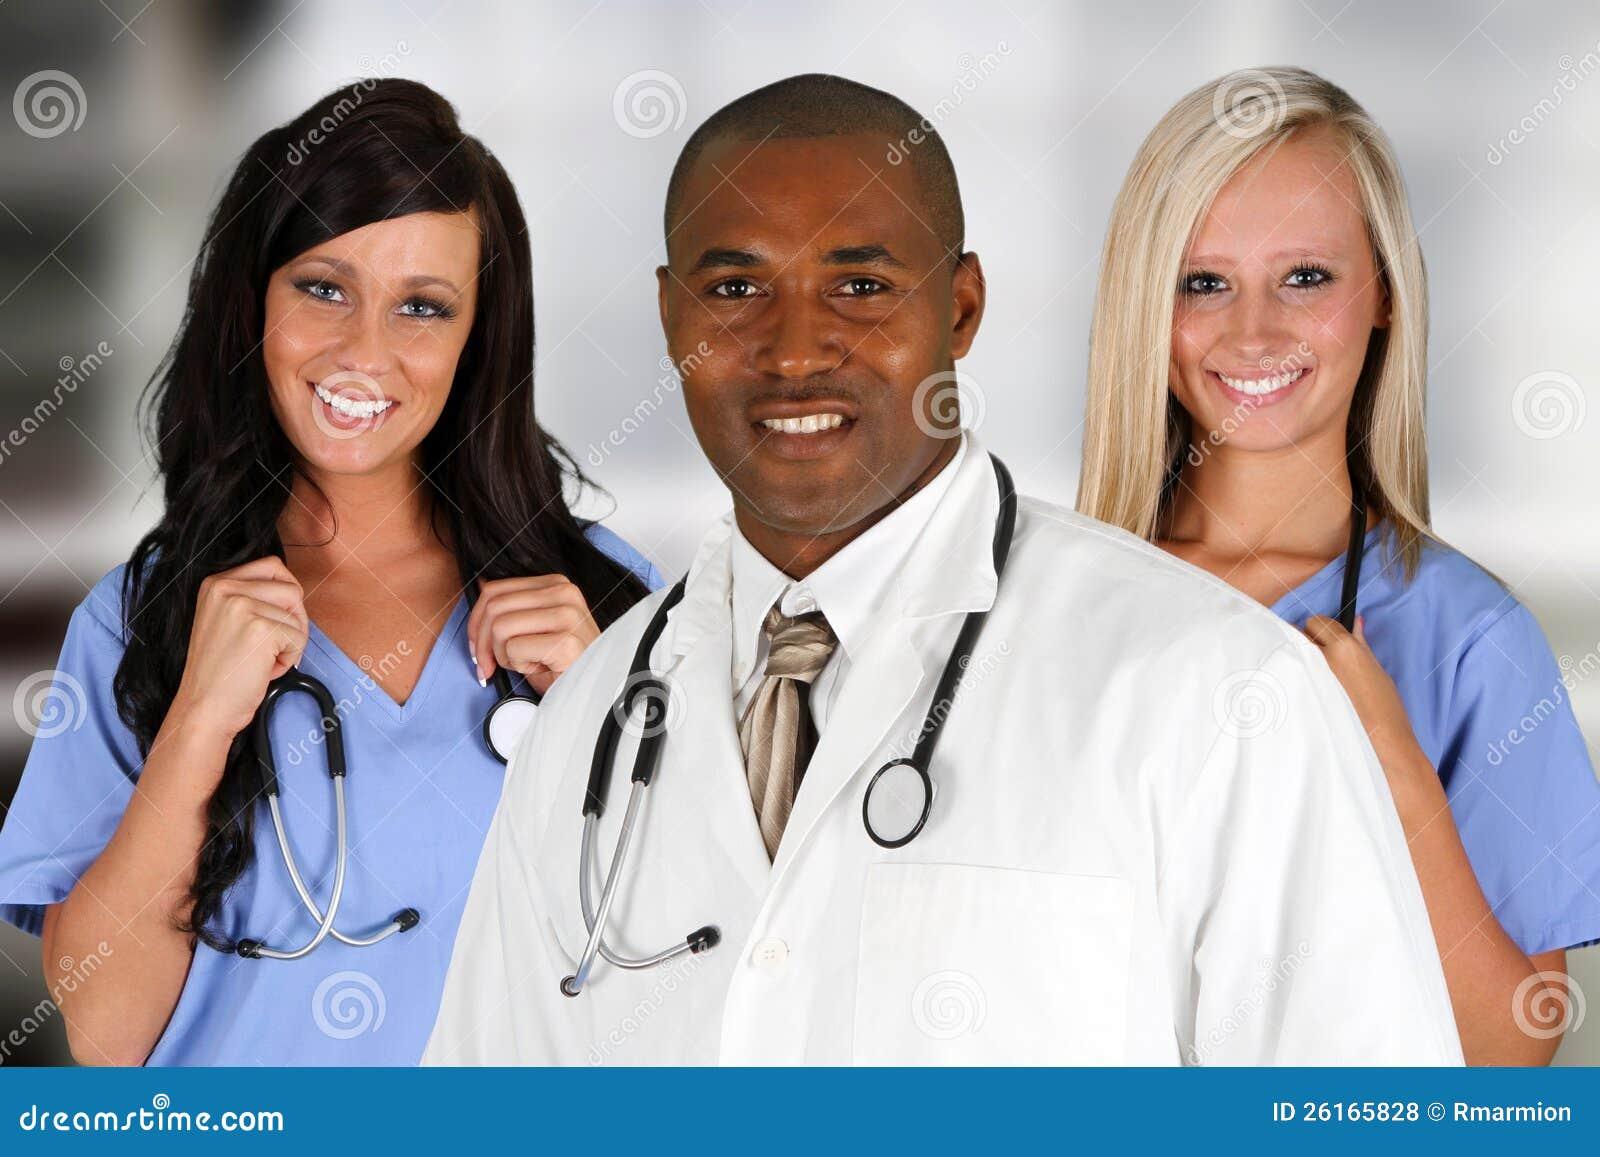 Hospital Staff Royalty Free Stock Photos - Image: 26165828